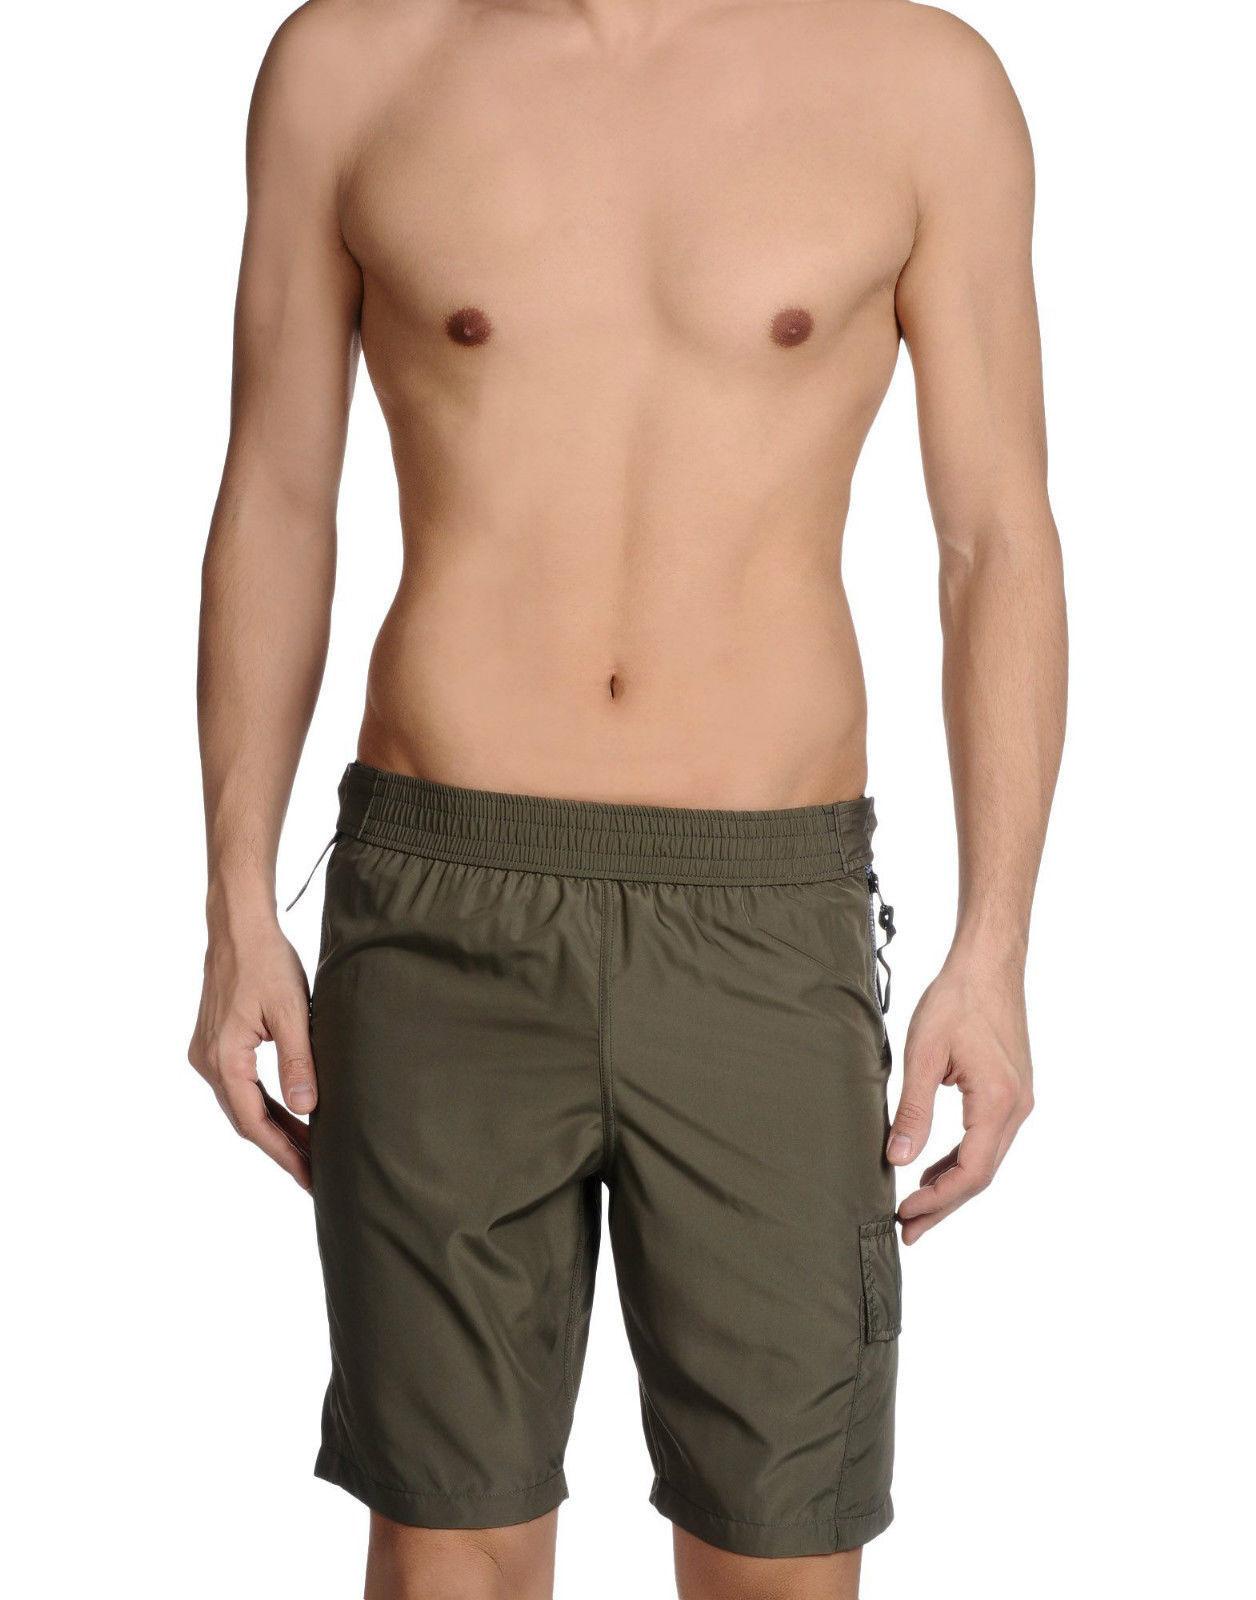 John Galliano Beachwear Swimming Trunks Board Swim Shorts W36 (52) W38 (54)